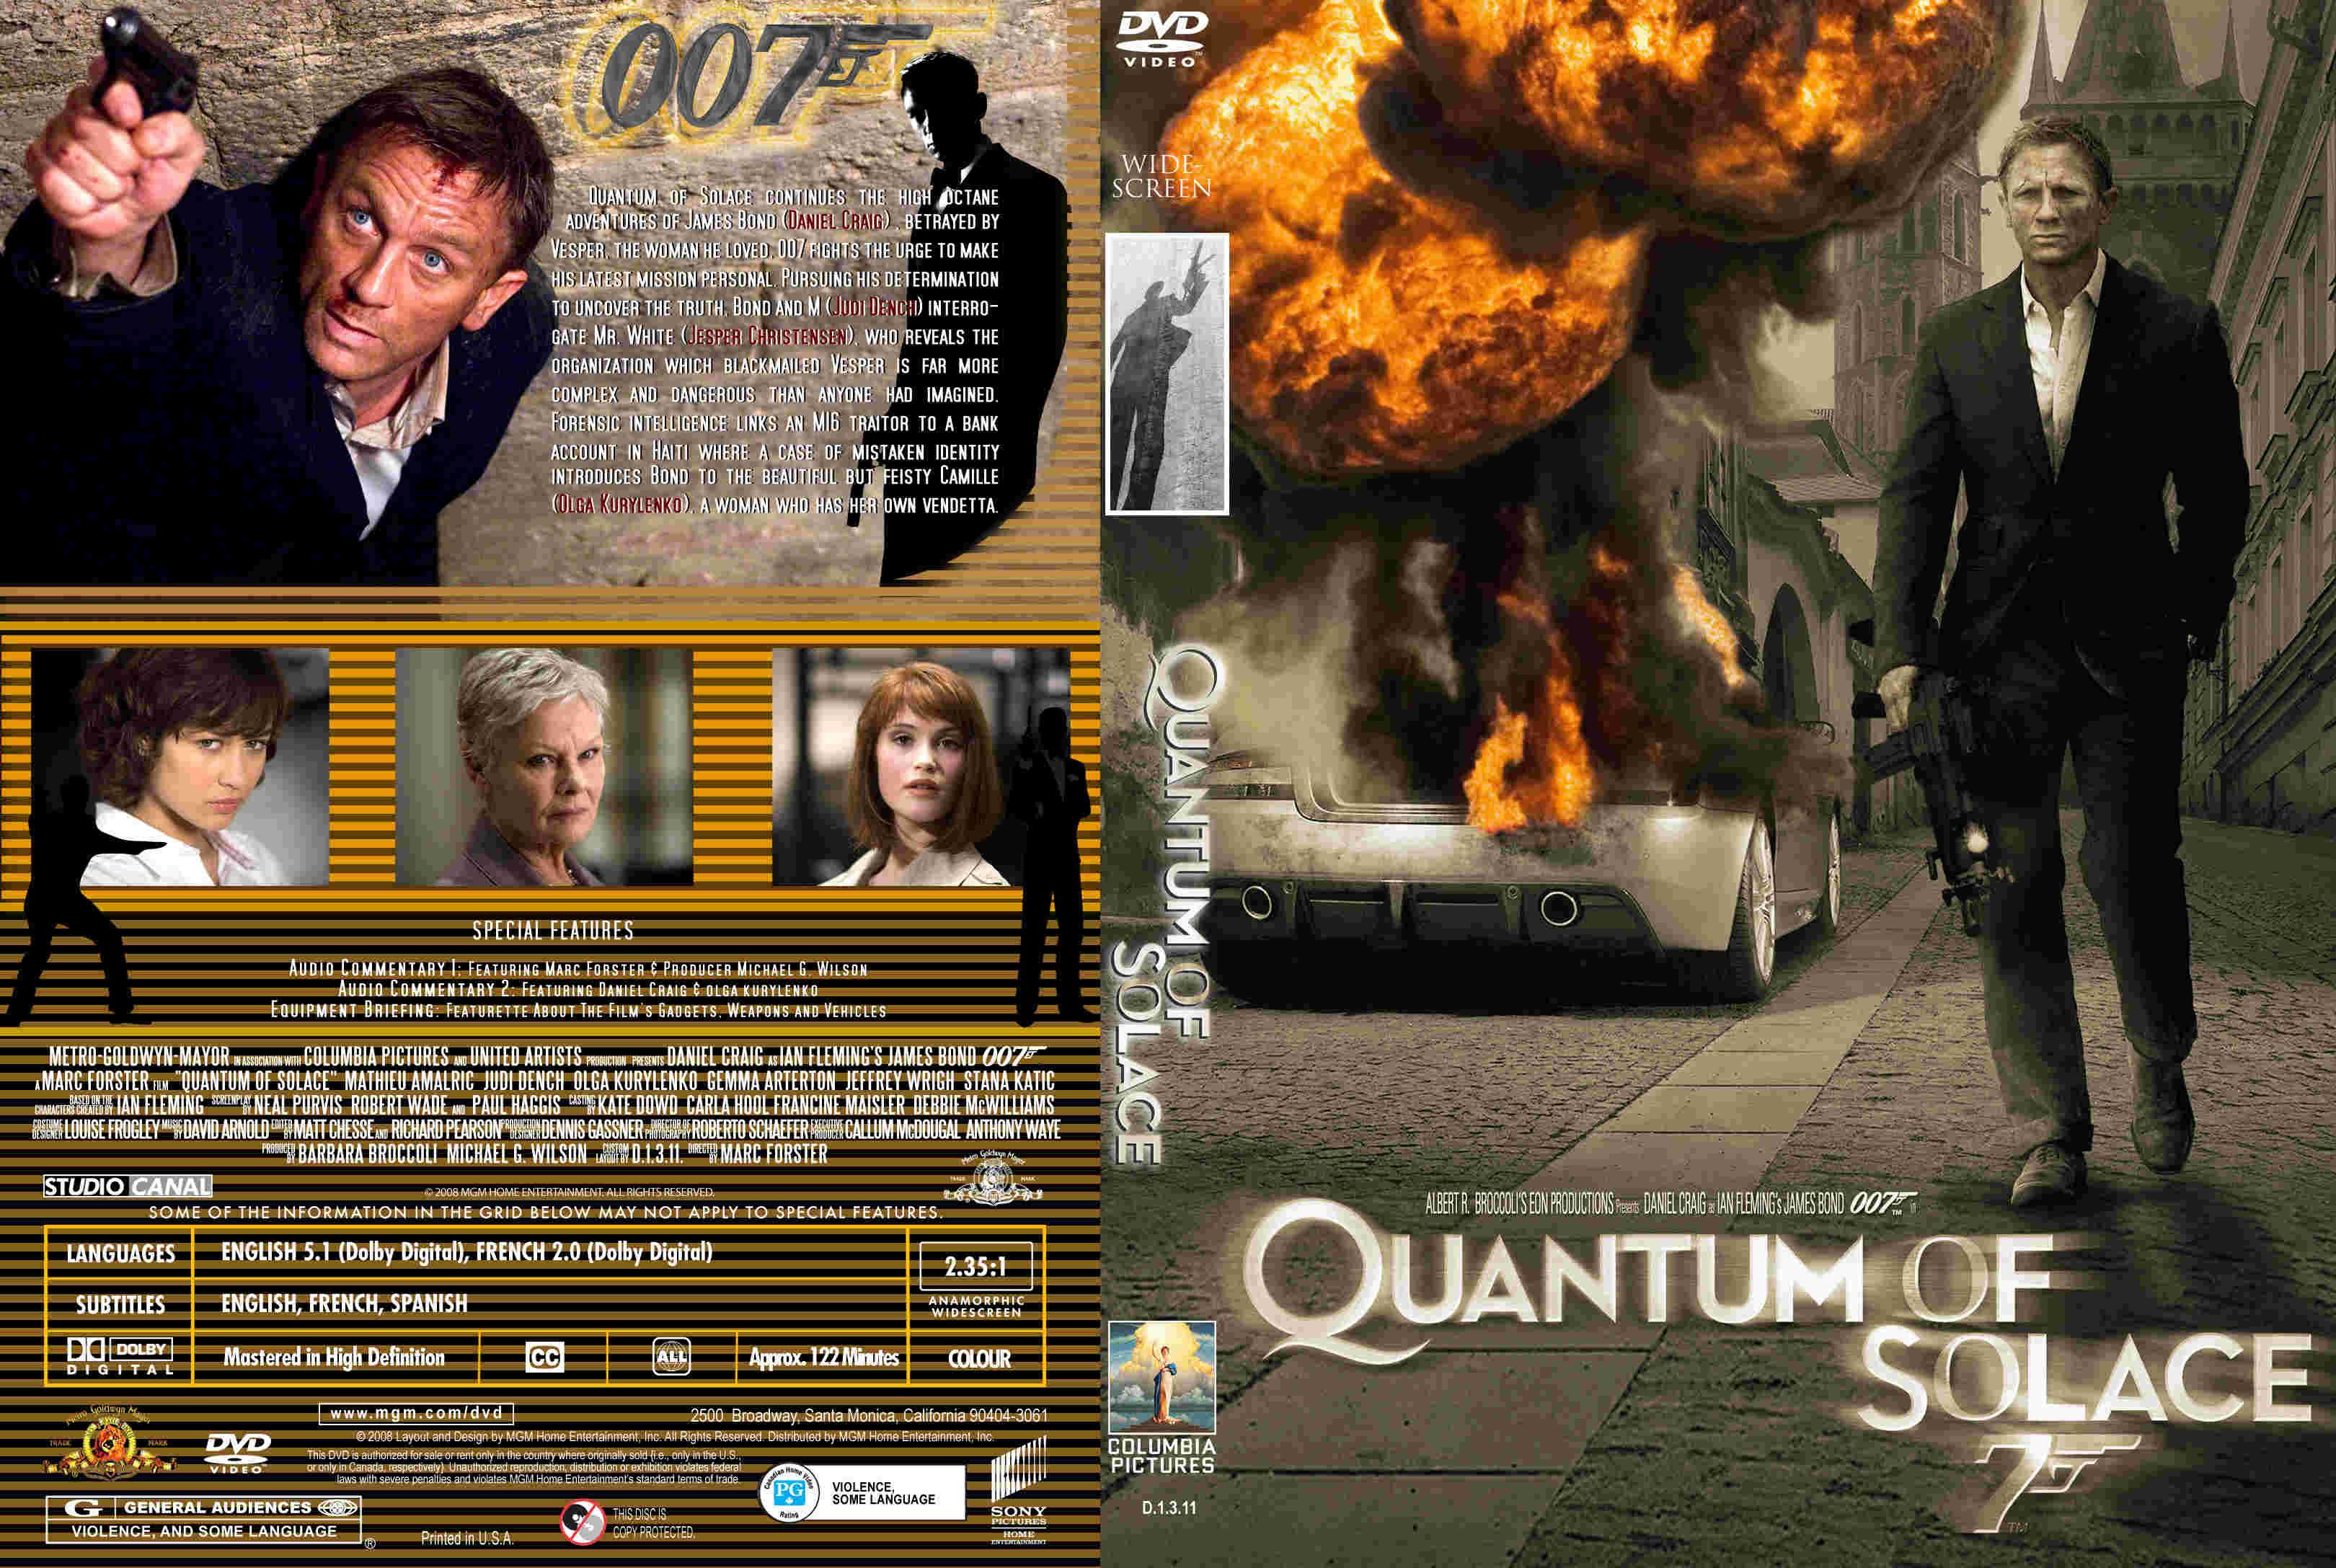 Quantum of solace dvd cover